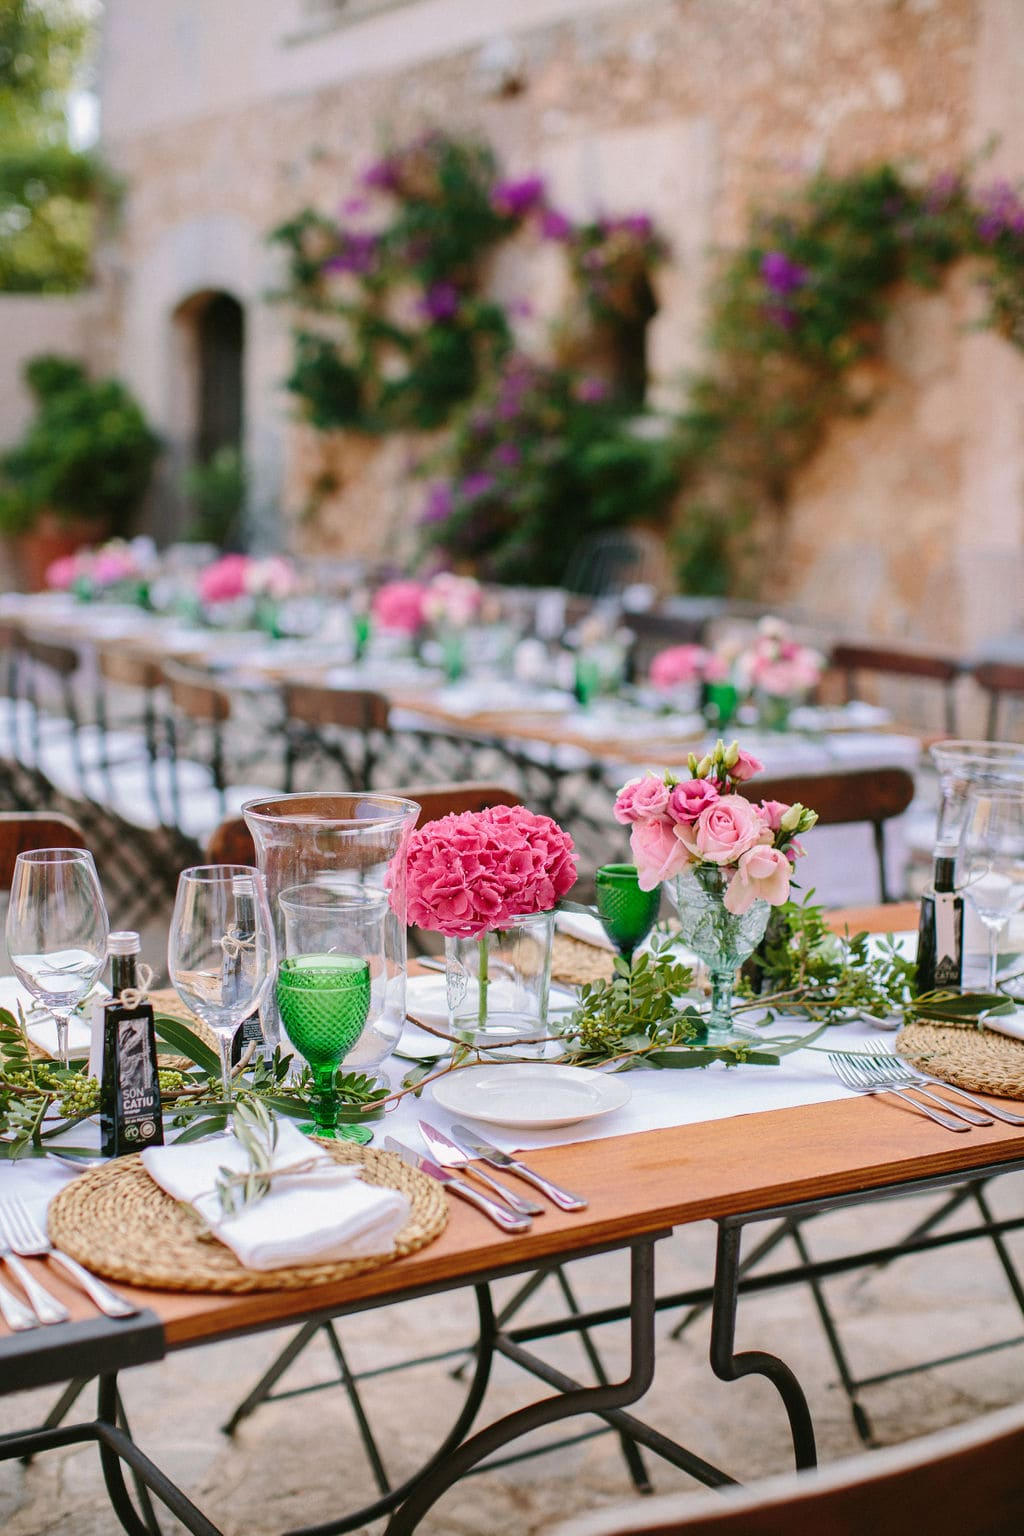 decoración floral, regalo de boda, montaje rústico para boda en la finca alaiar Mallorca